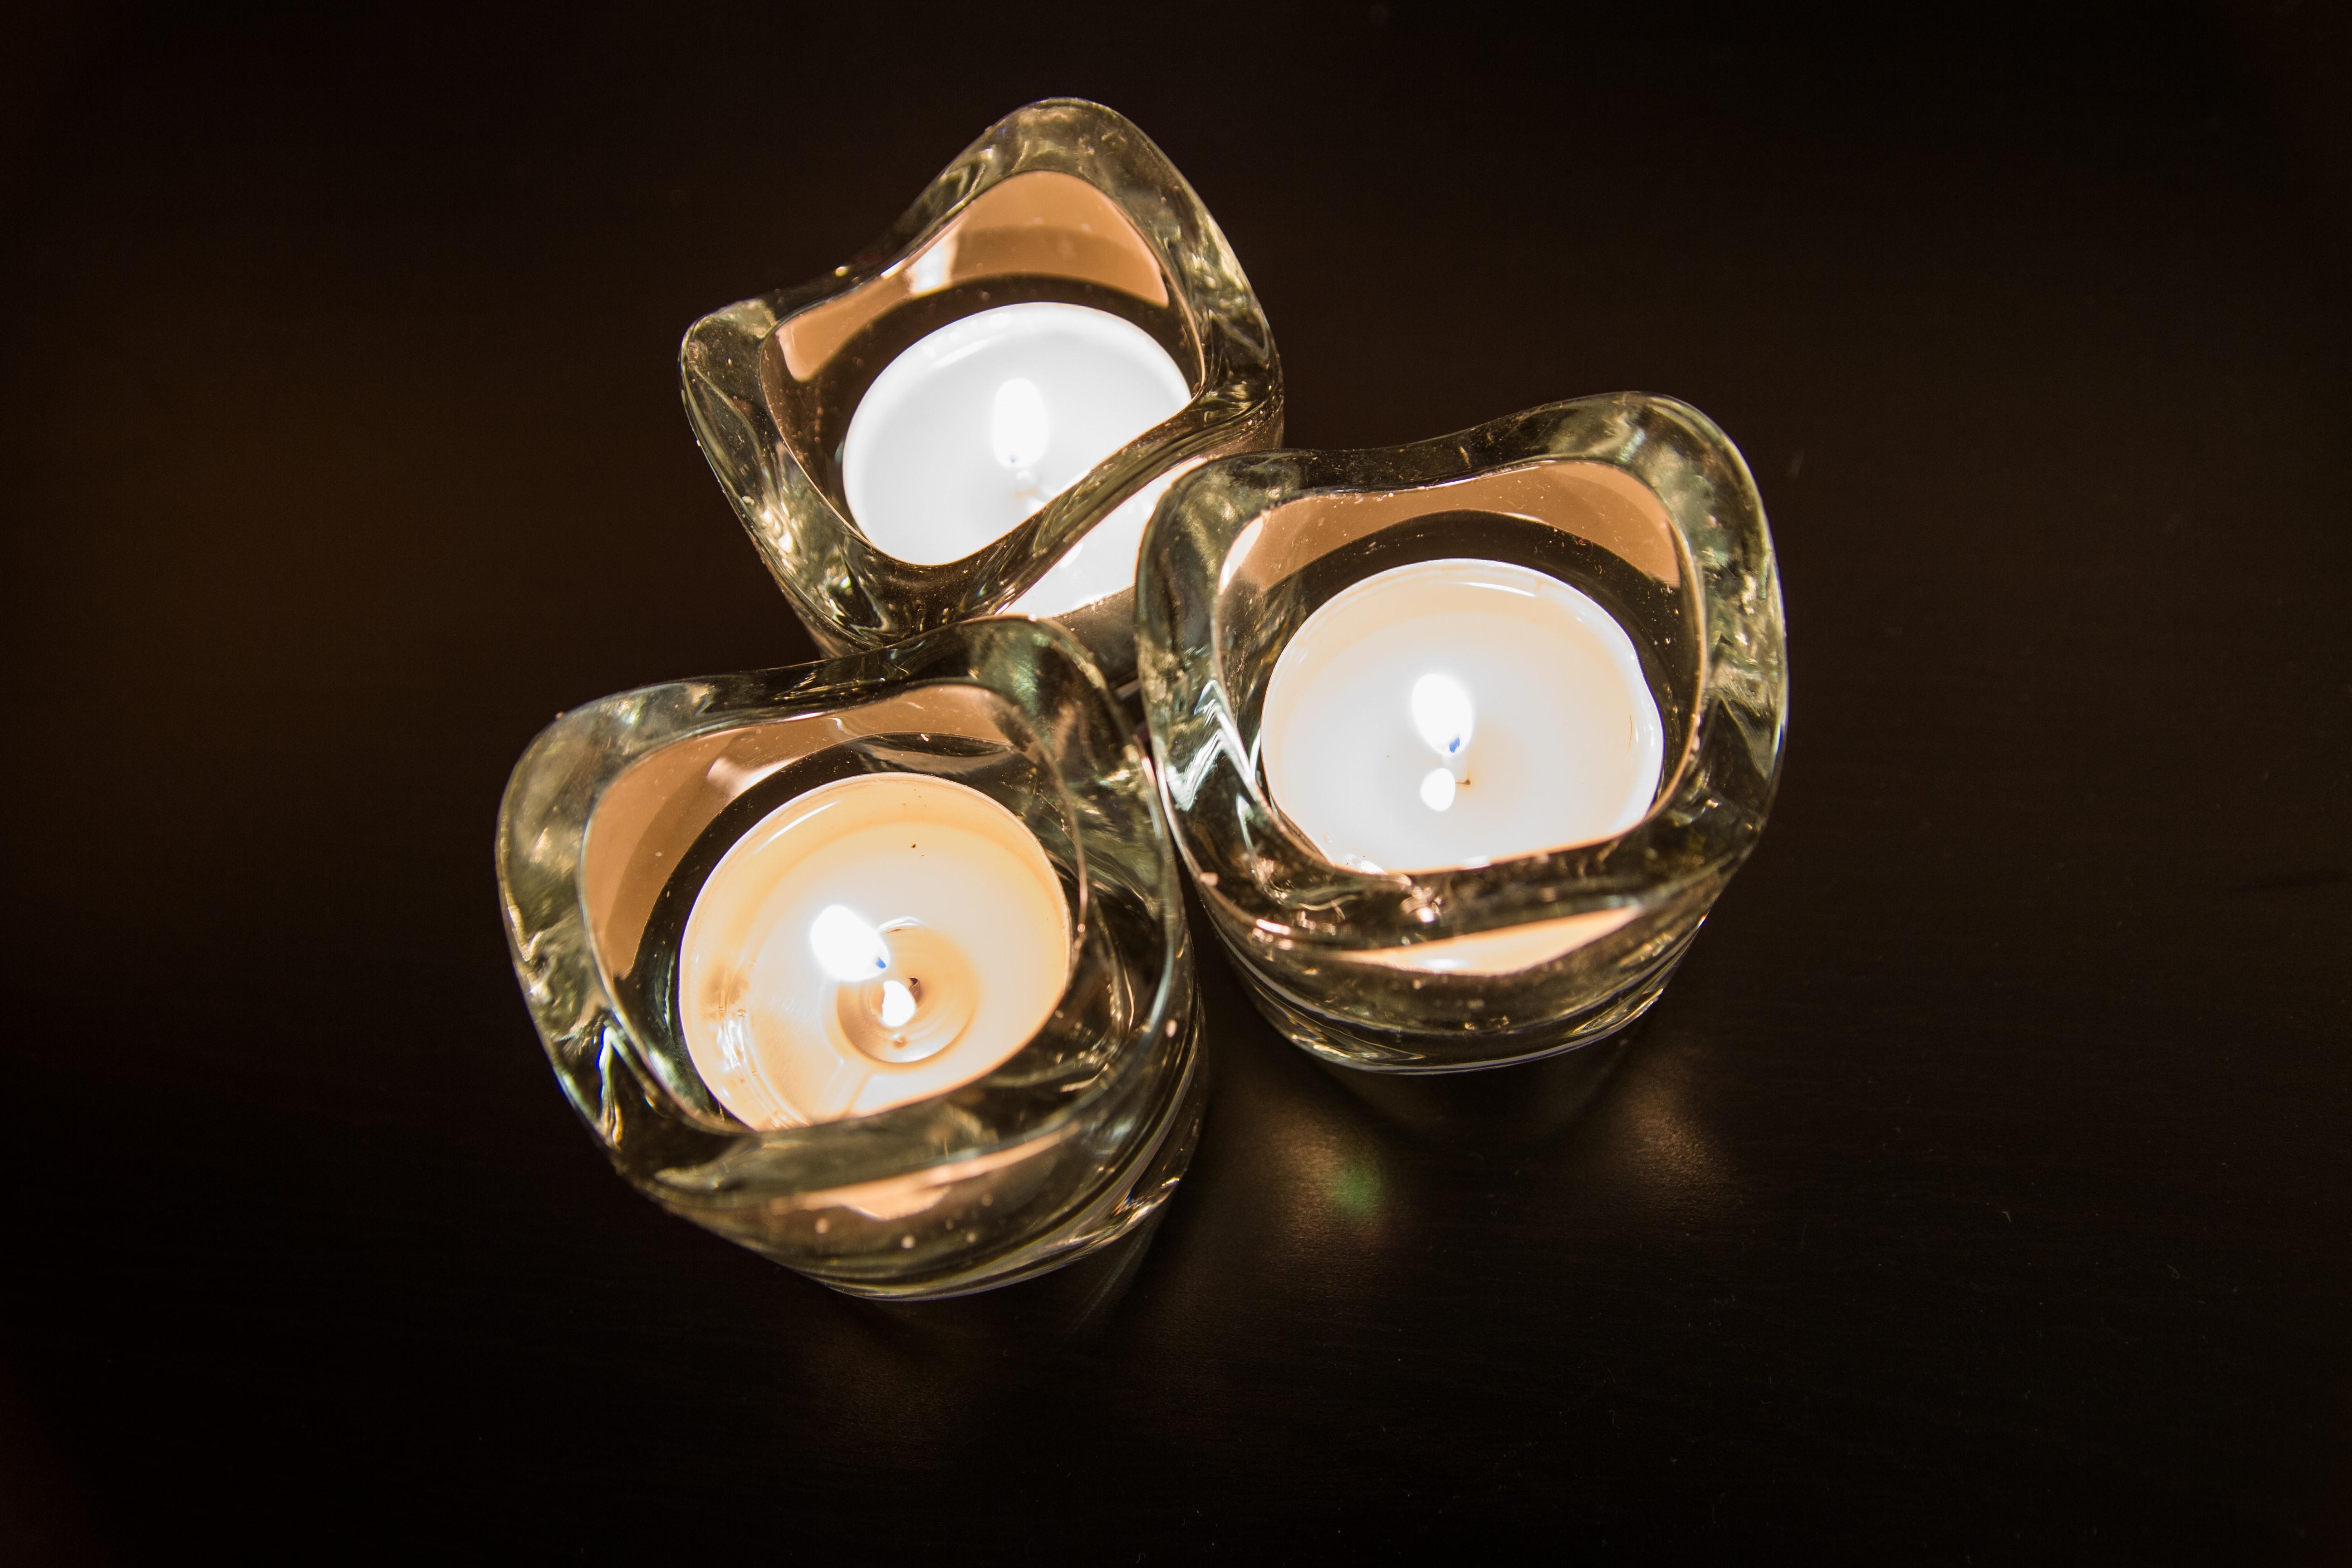 Candles at night, Lights, Light, Moody, Night, HQ Photo